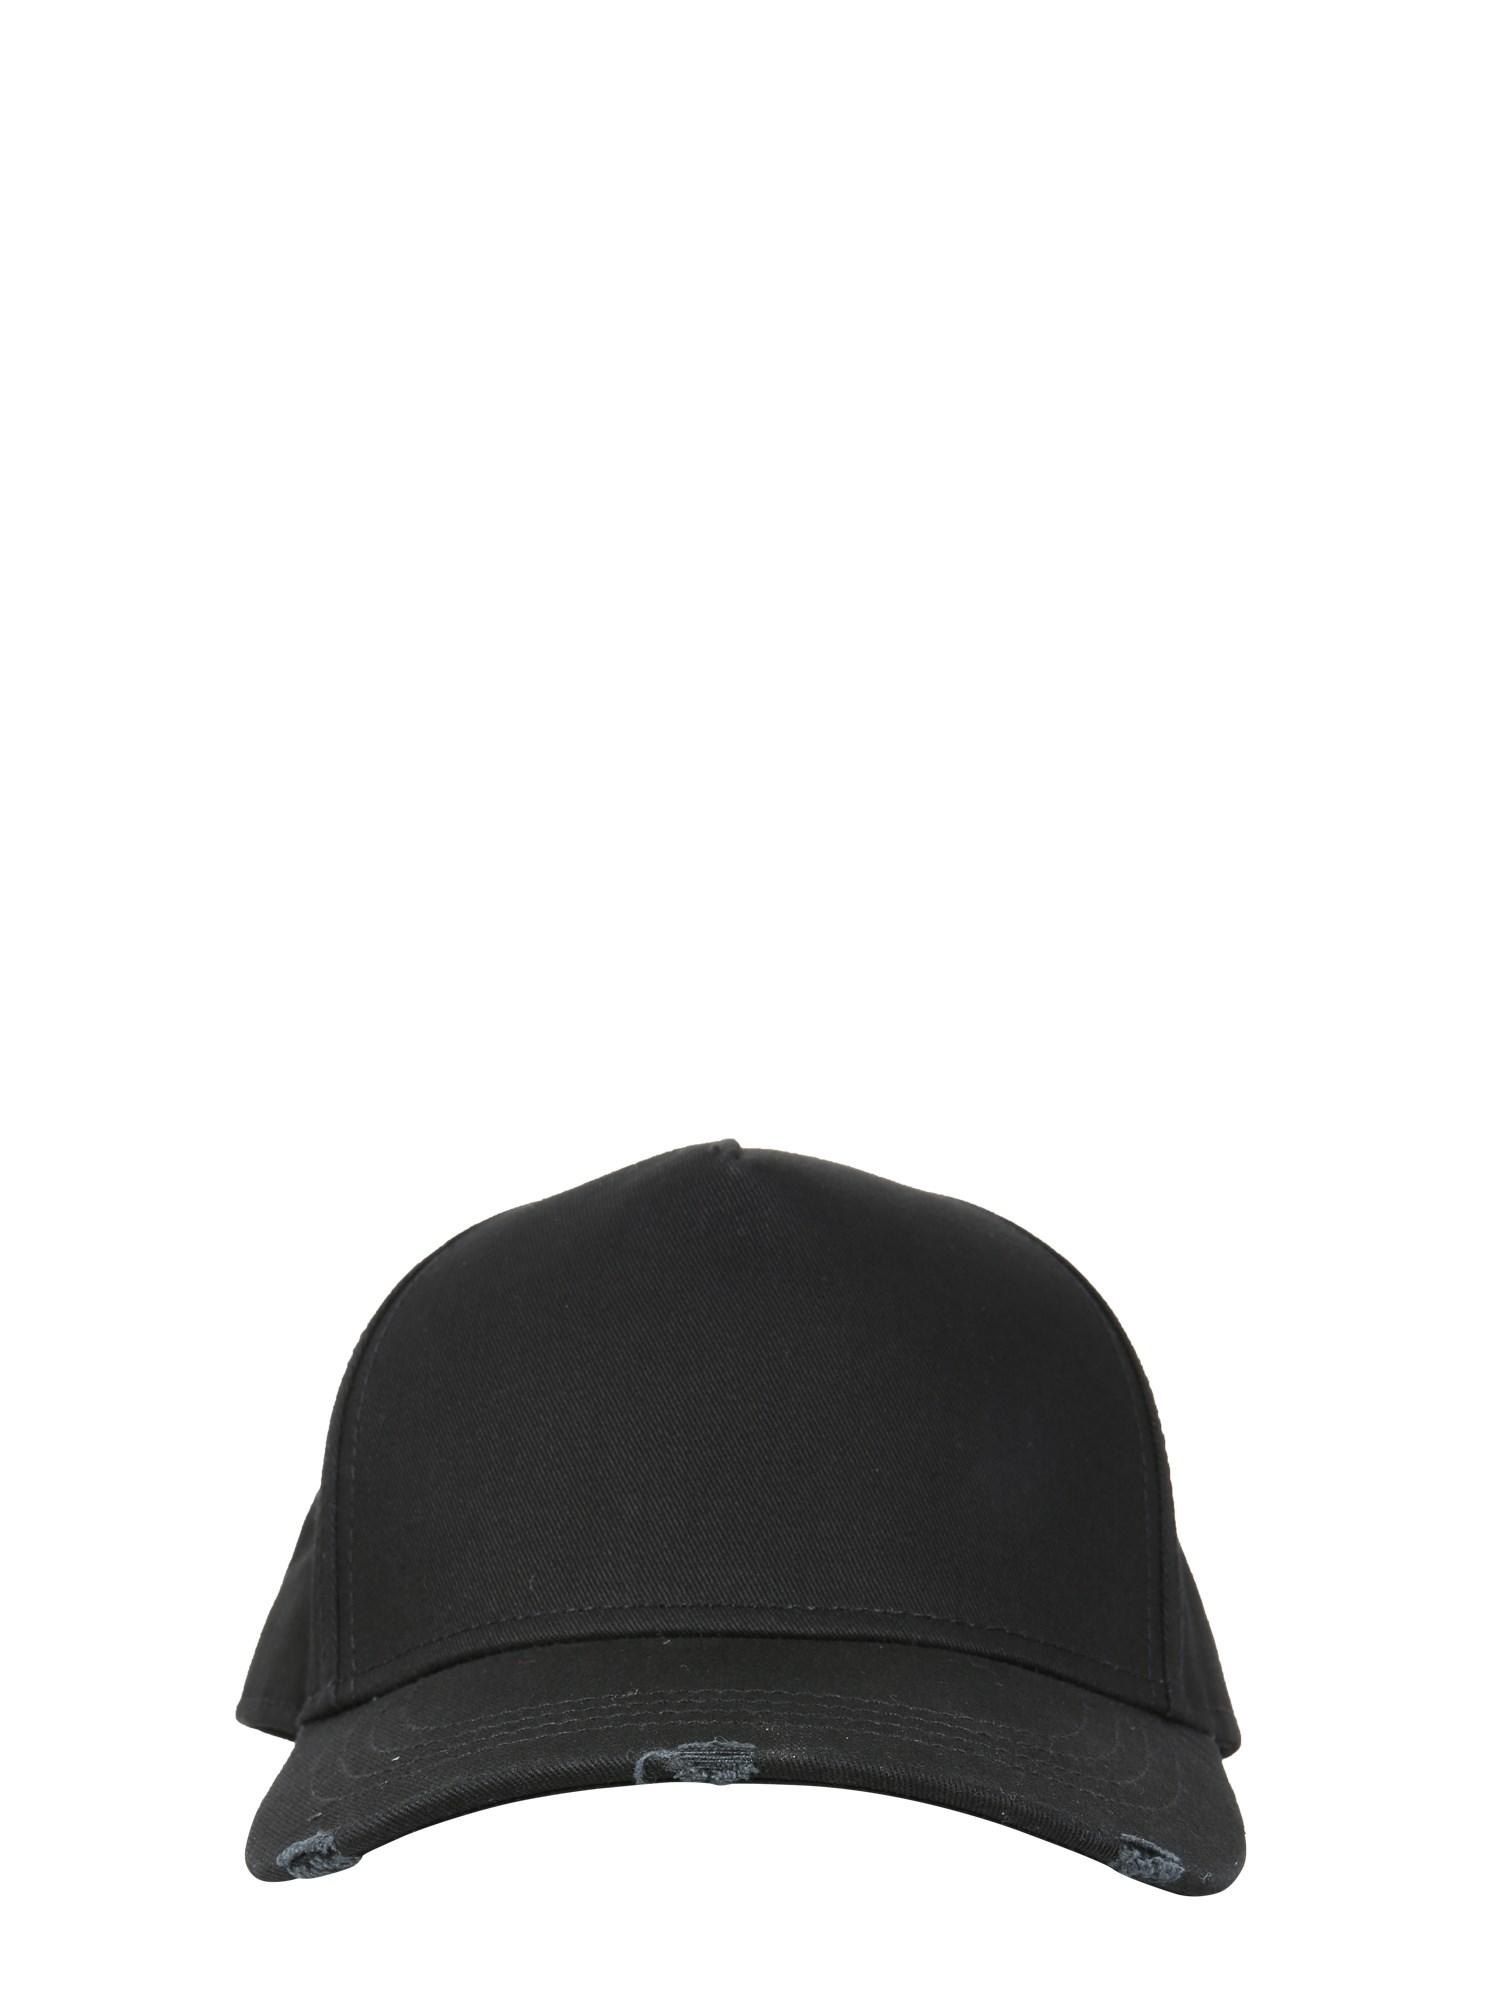 Dsquared baseball cap - dsquared - Modalova